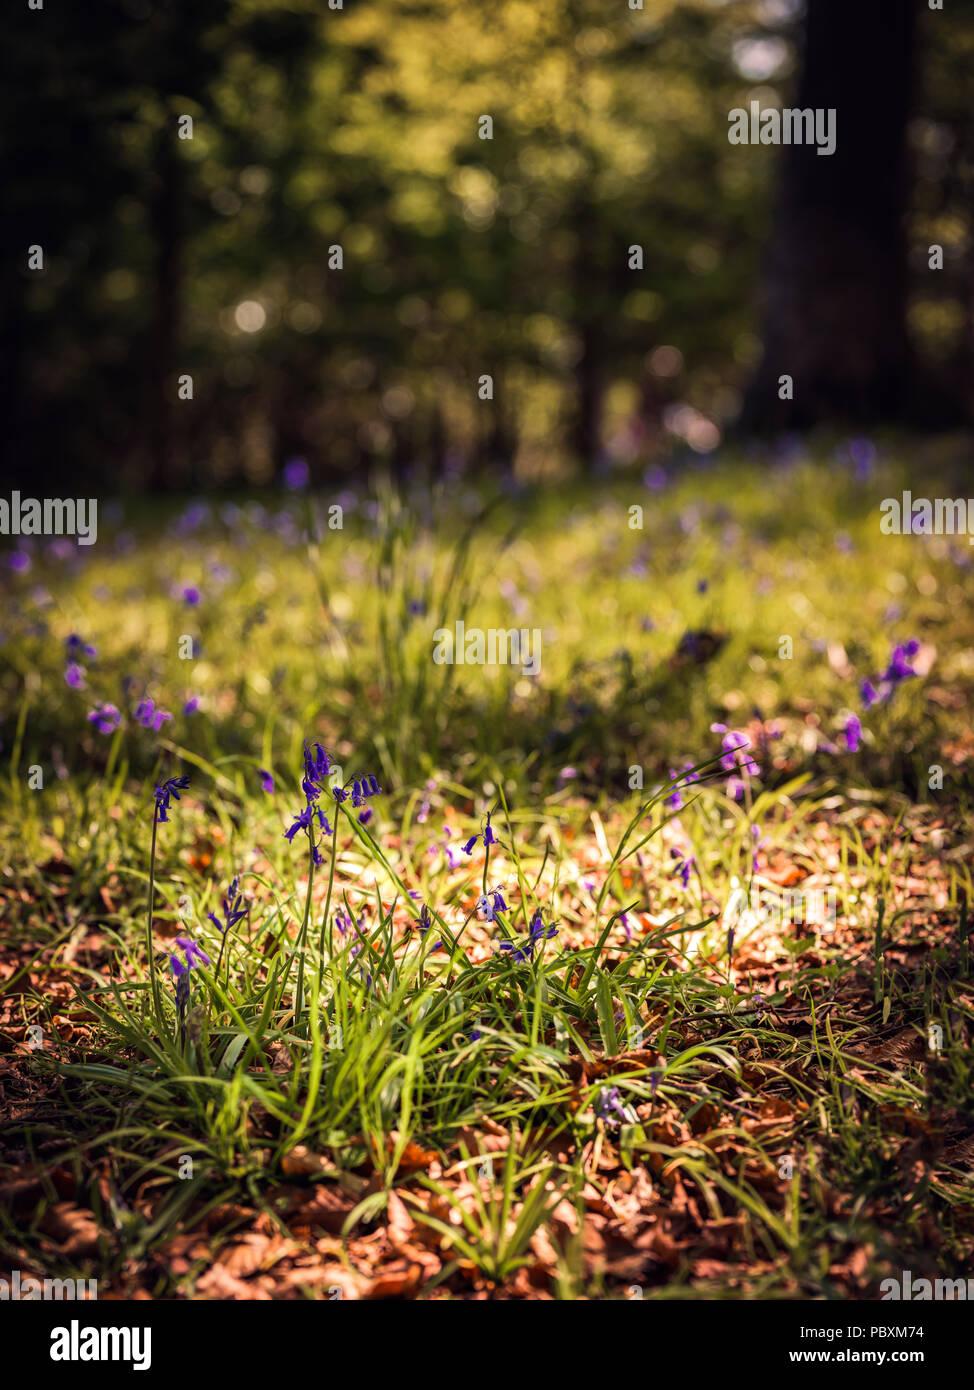 Garden Centre: Spring Flowers Scotland Stock Photos & Spring Flowers